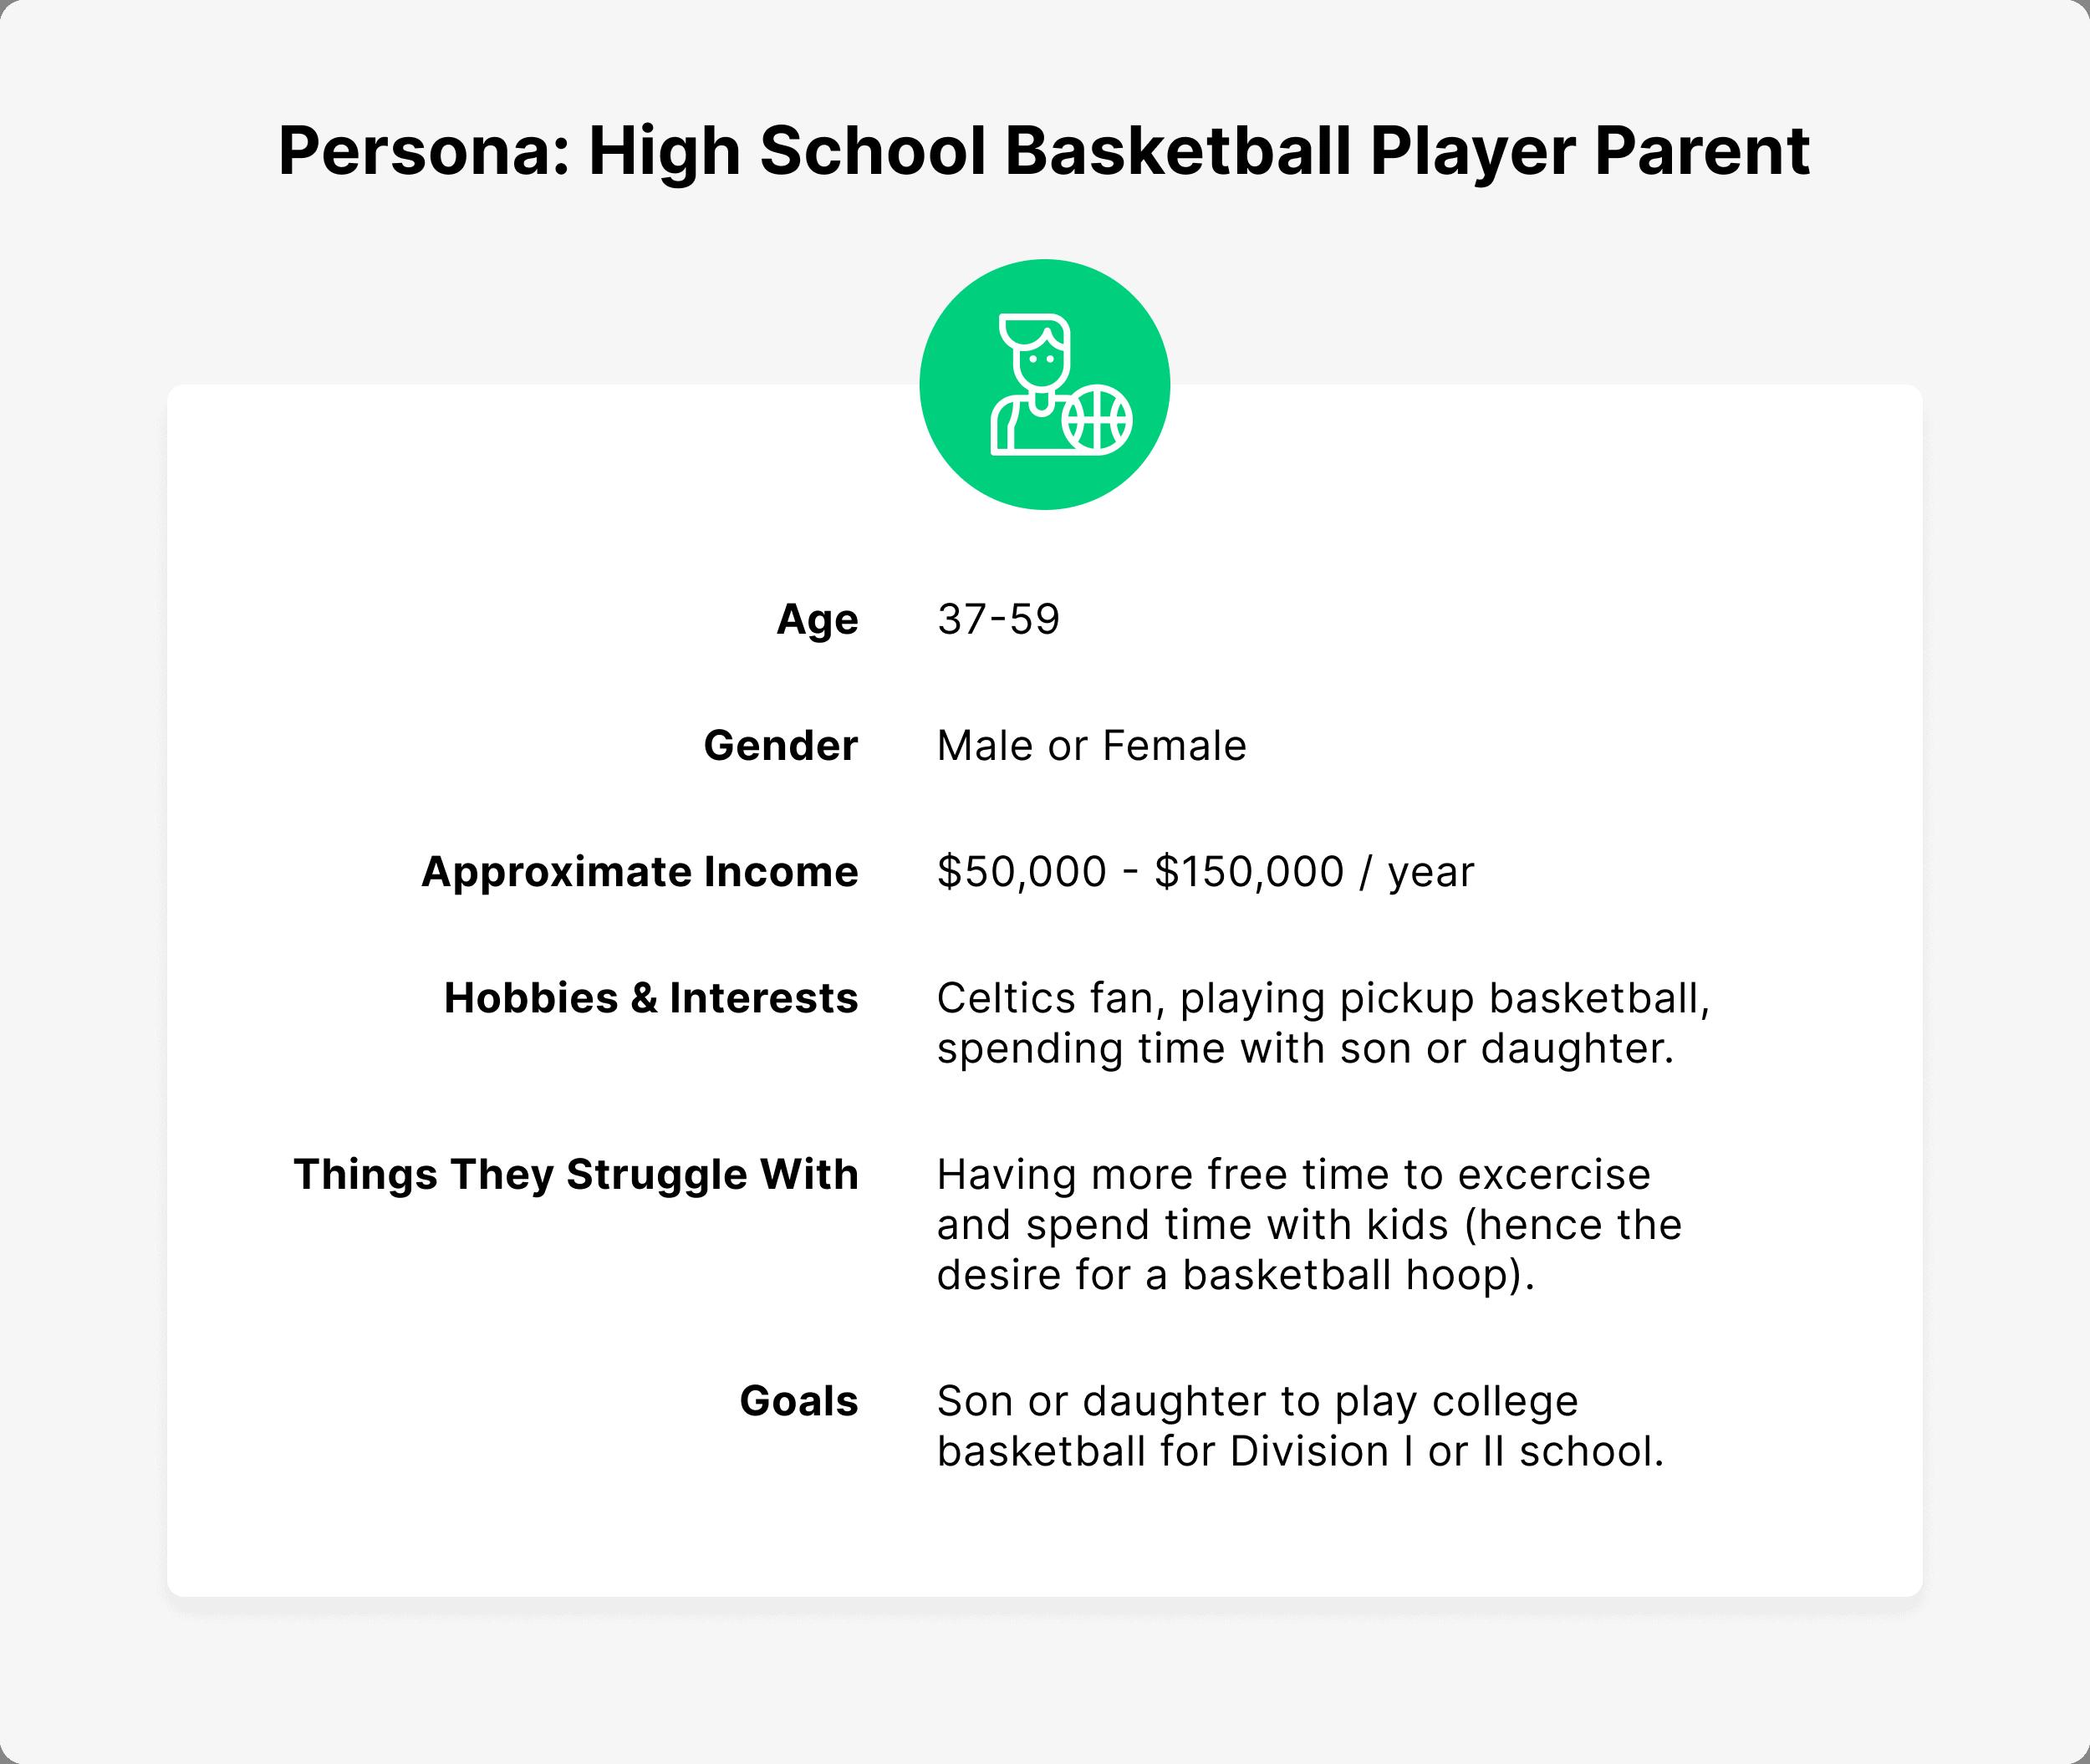 Basketball persona